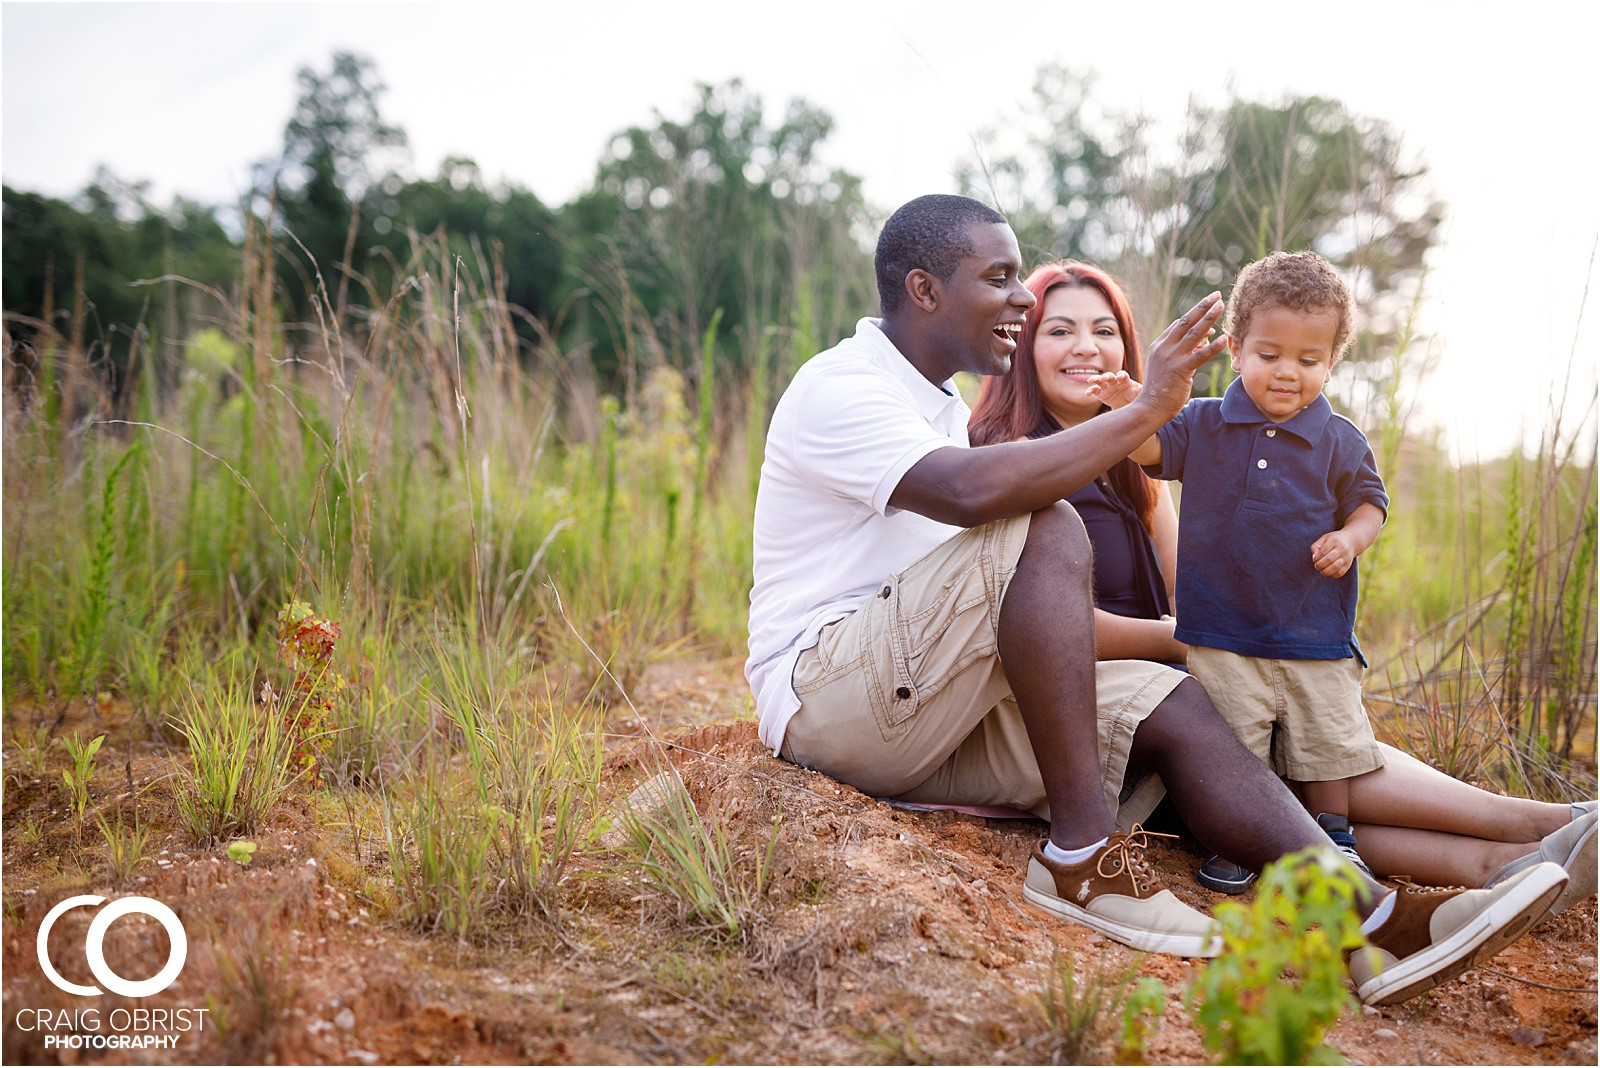 Grass Field Family Portratis Sunset Atlanta_0023.jpg